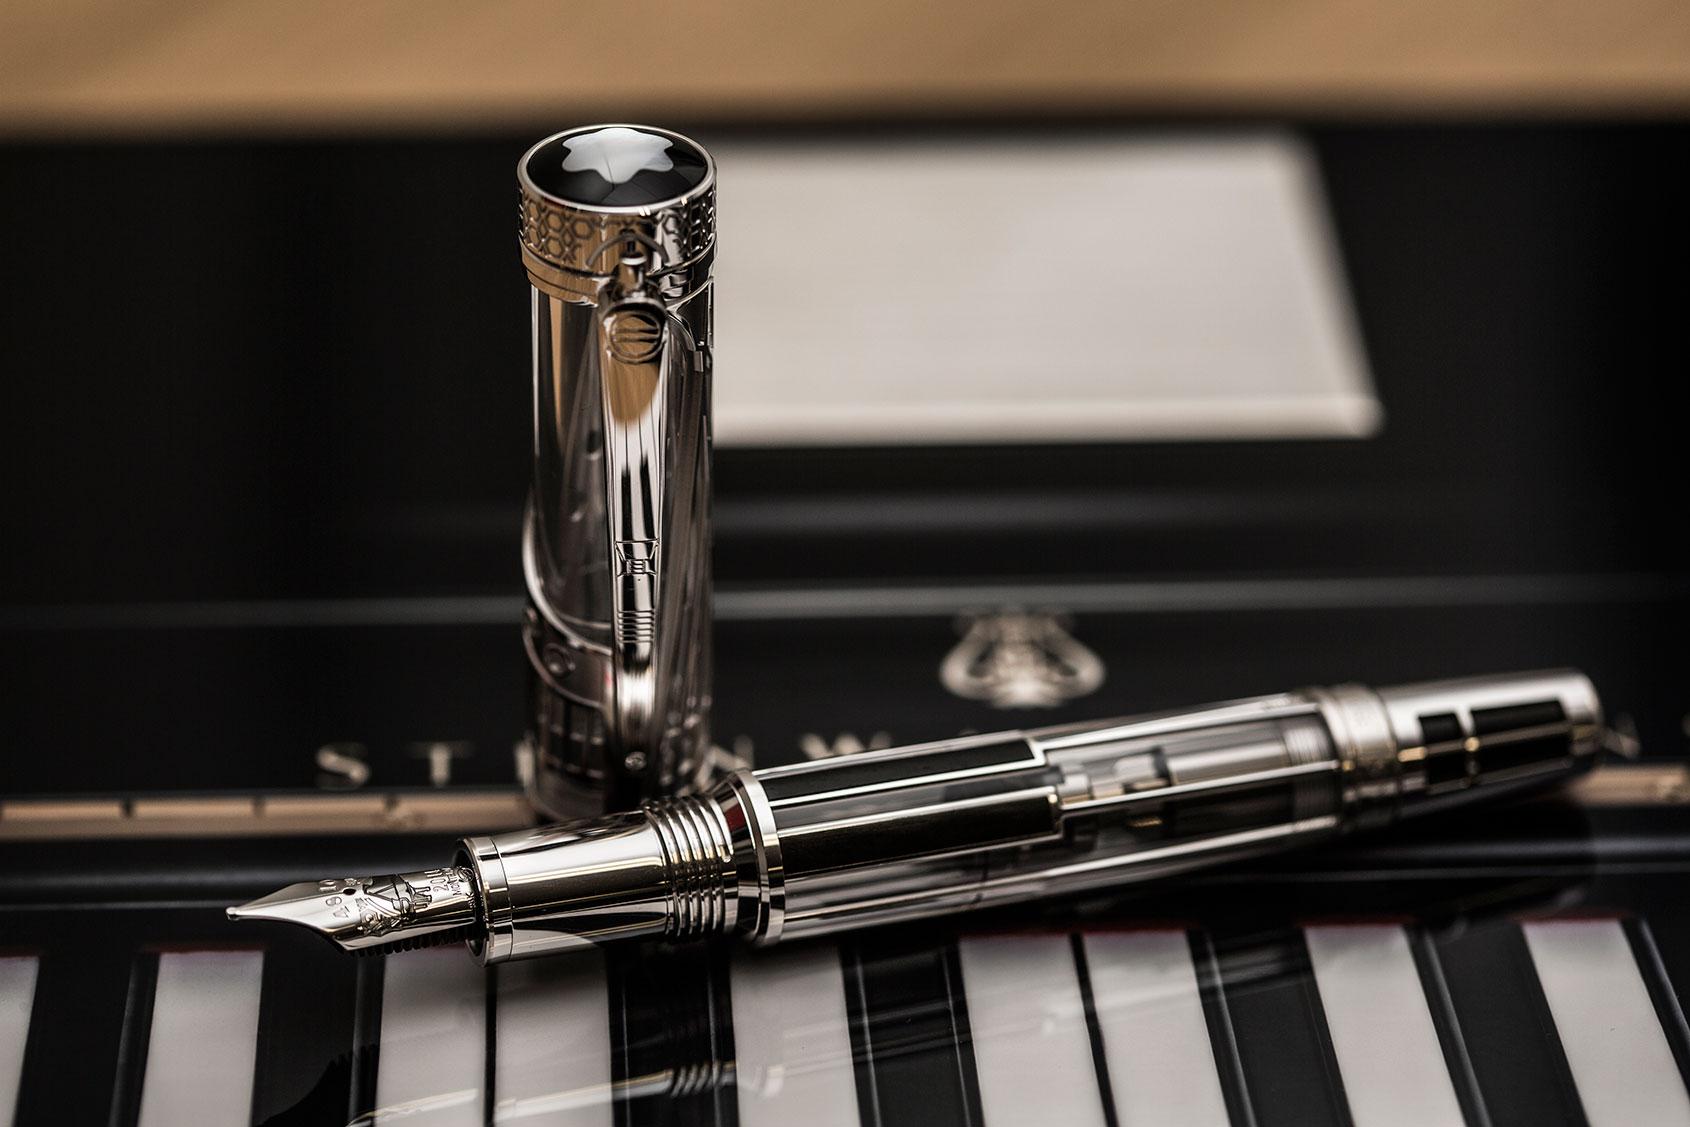 montblanc-writing-instrument-5